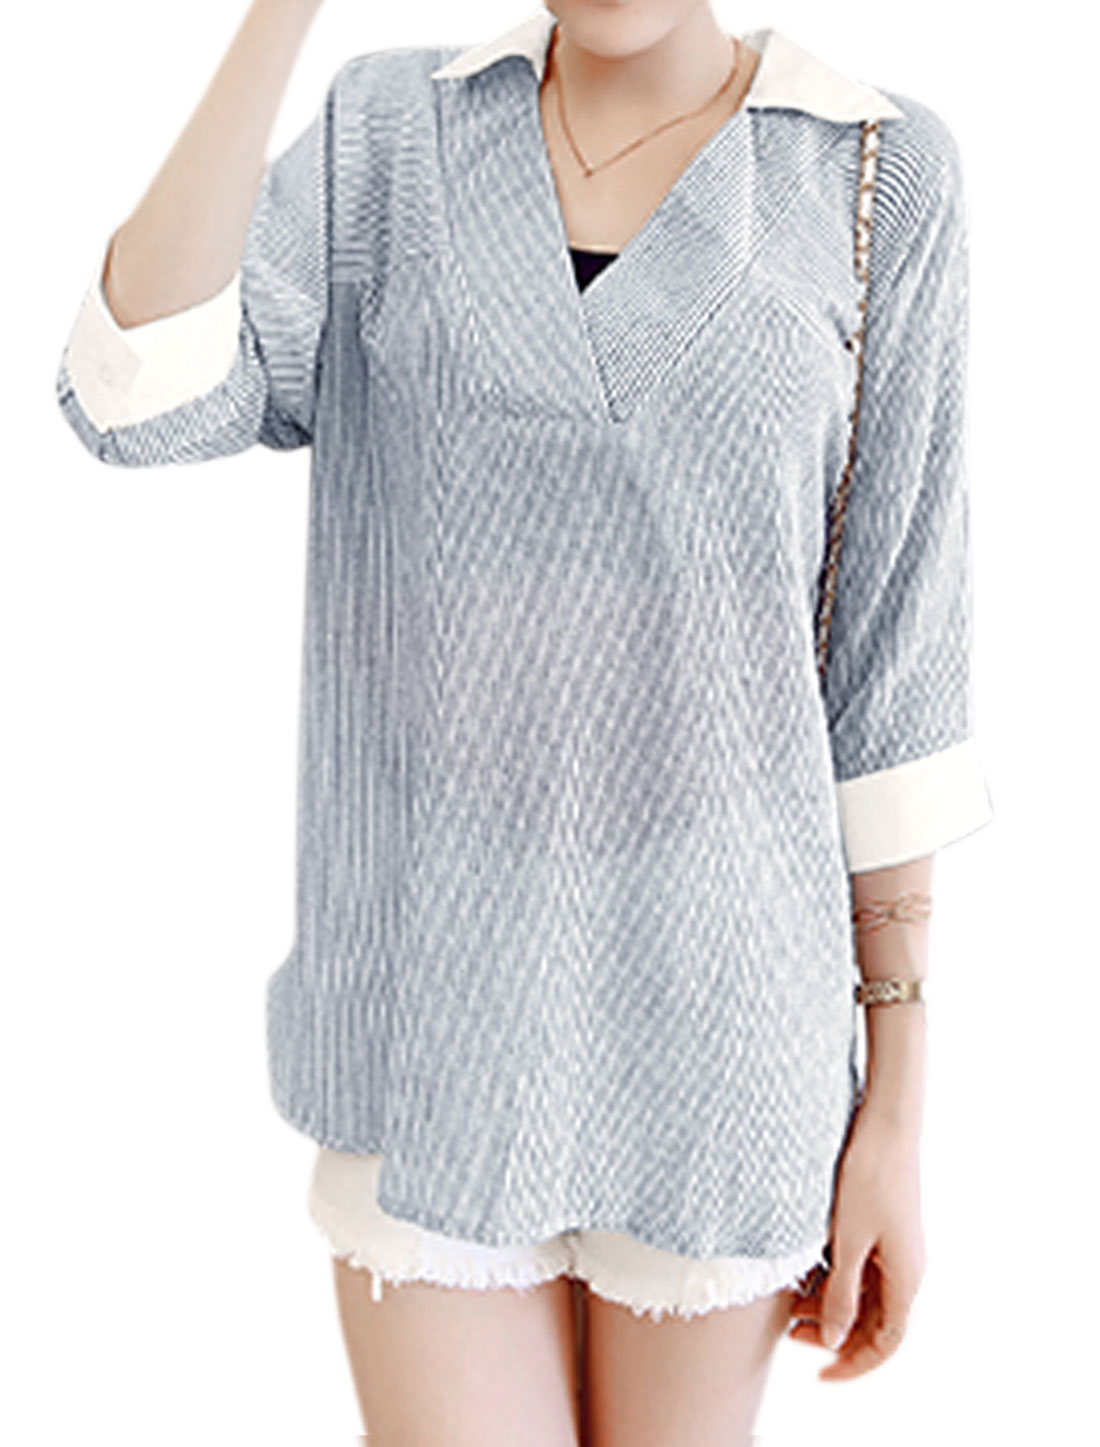 Ladies Turn Down Collar Stripes 3/4 Sleeve Casual Blouse Black White XS